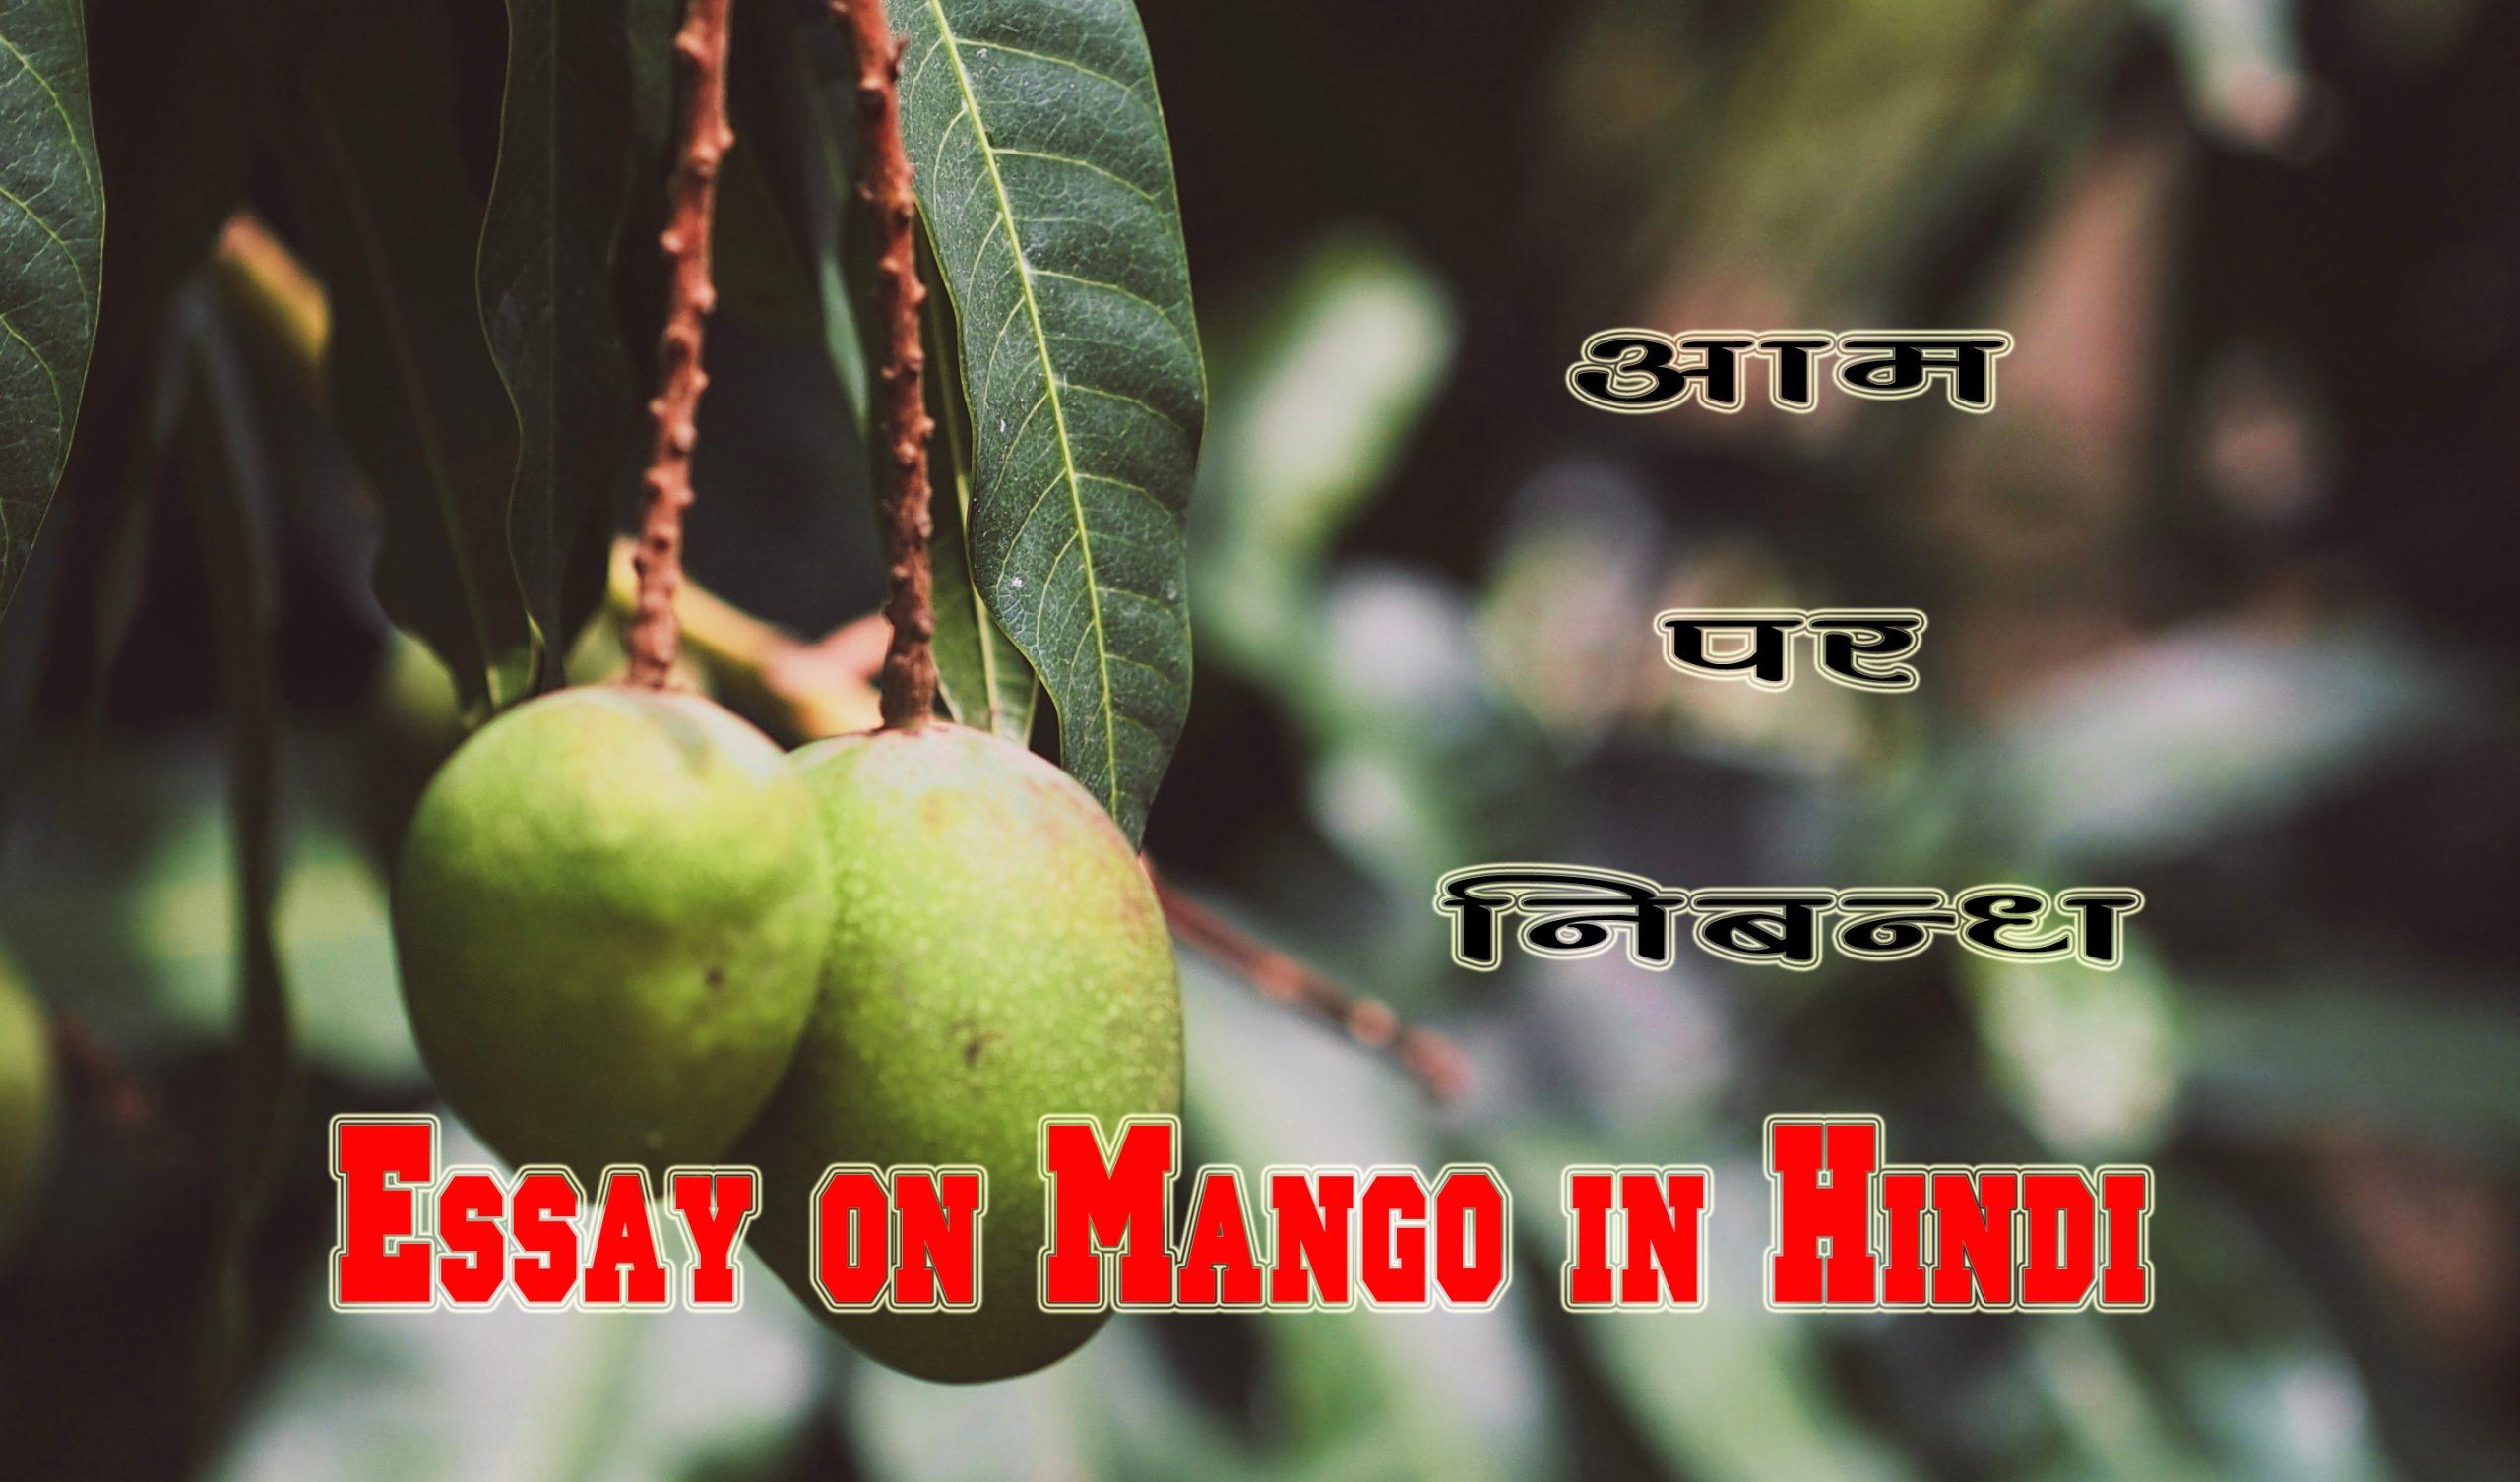 Essay on Mango in Hindi